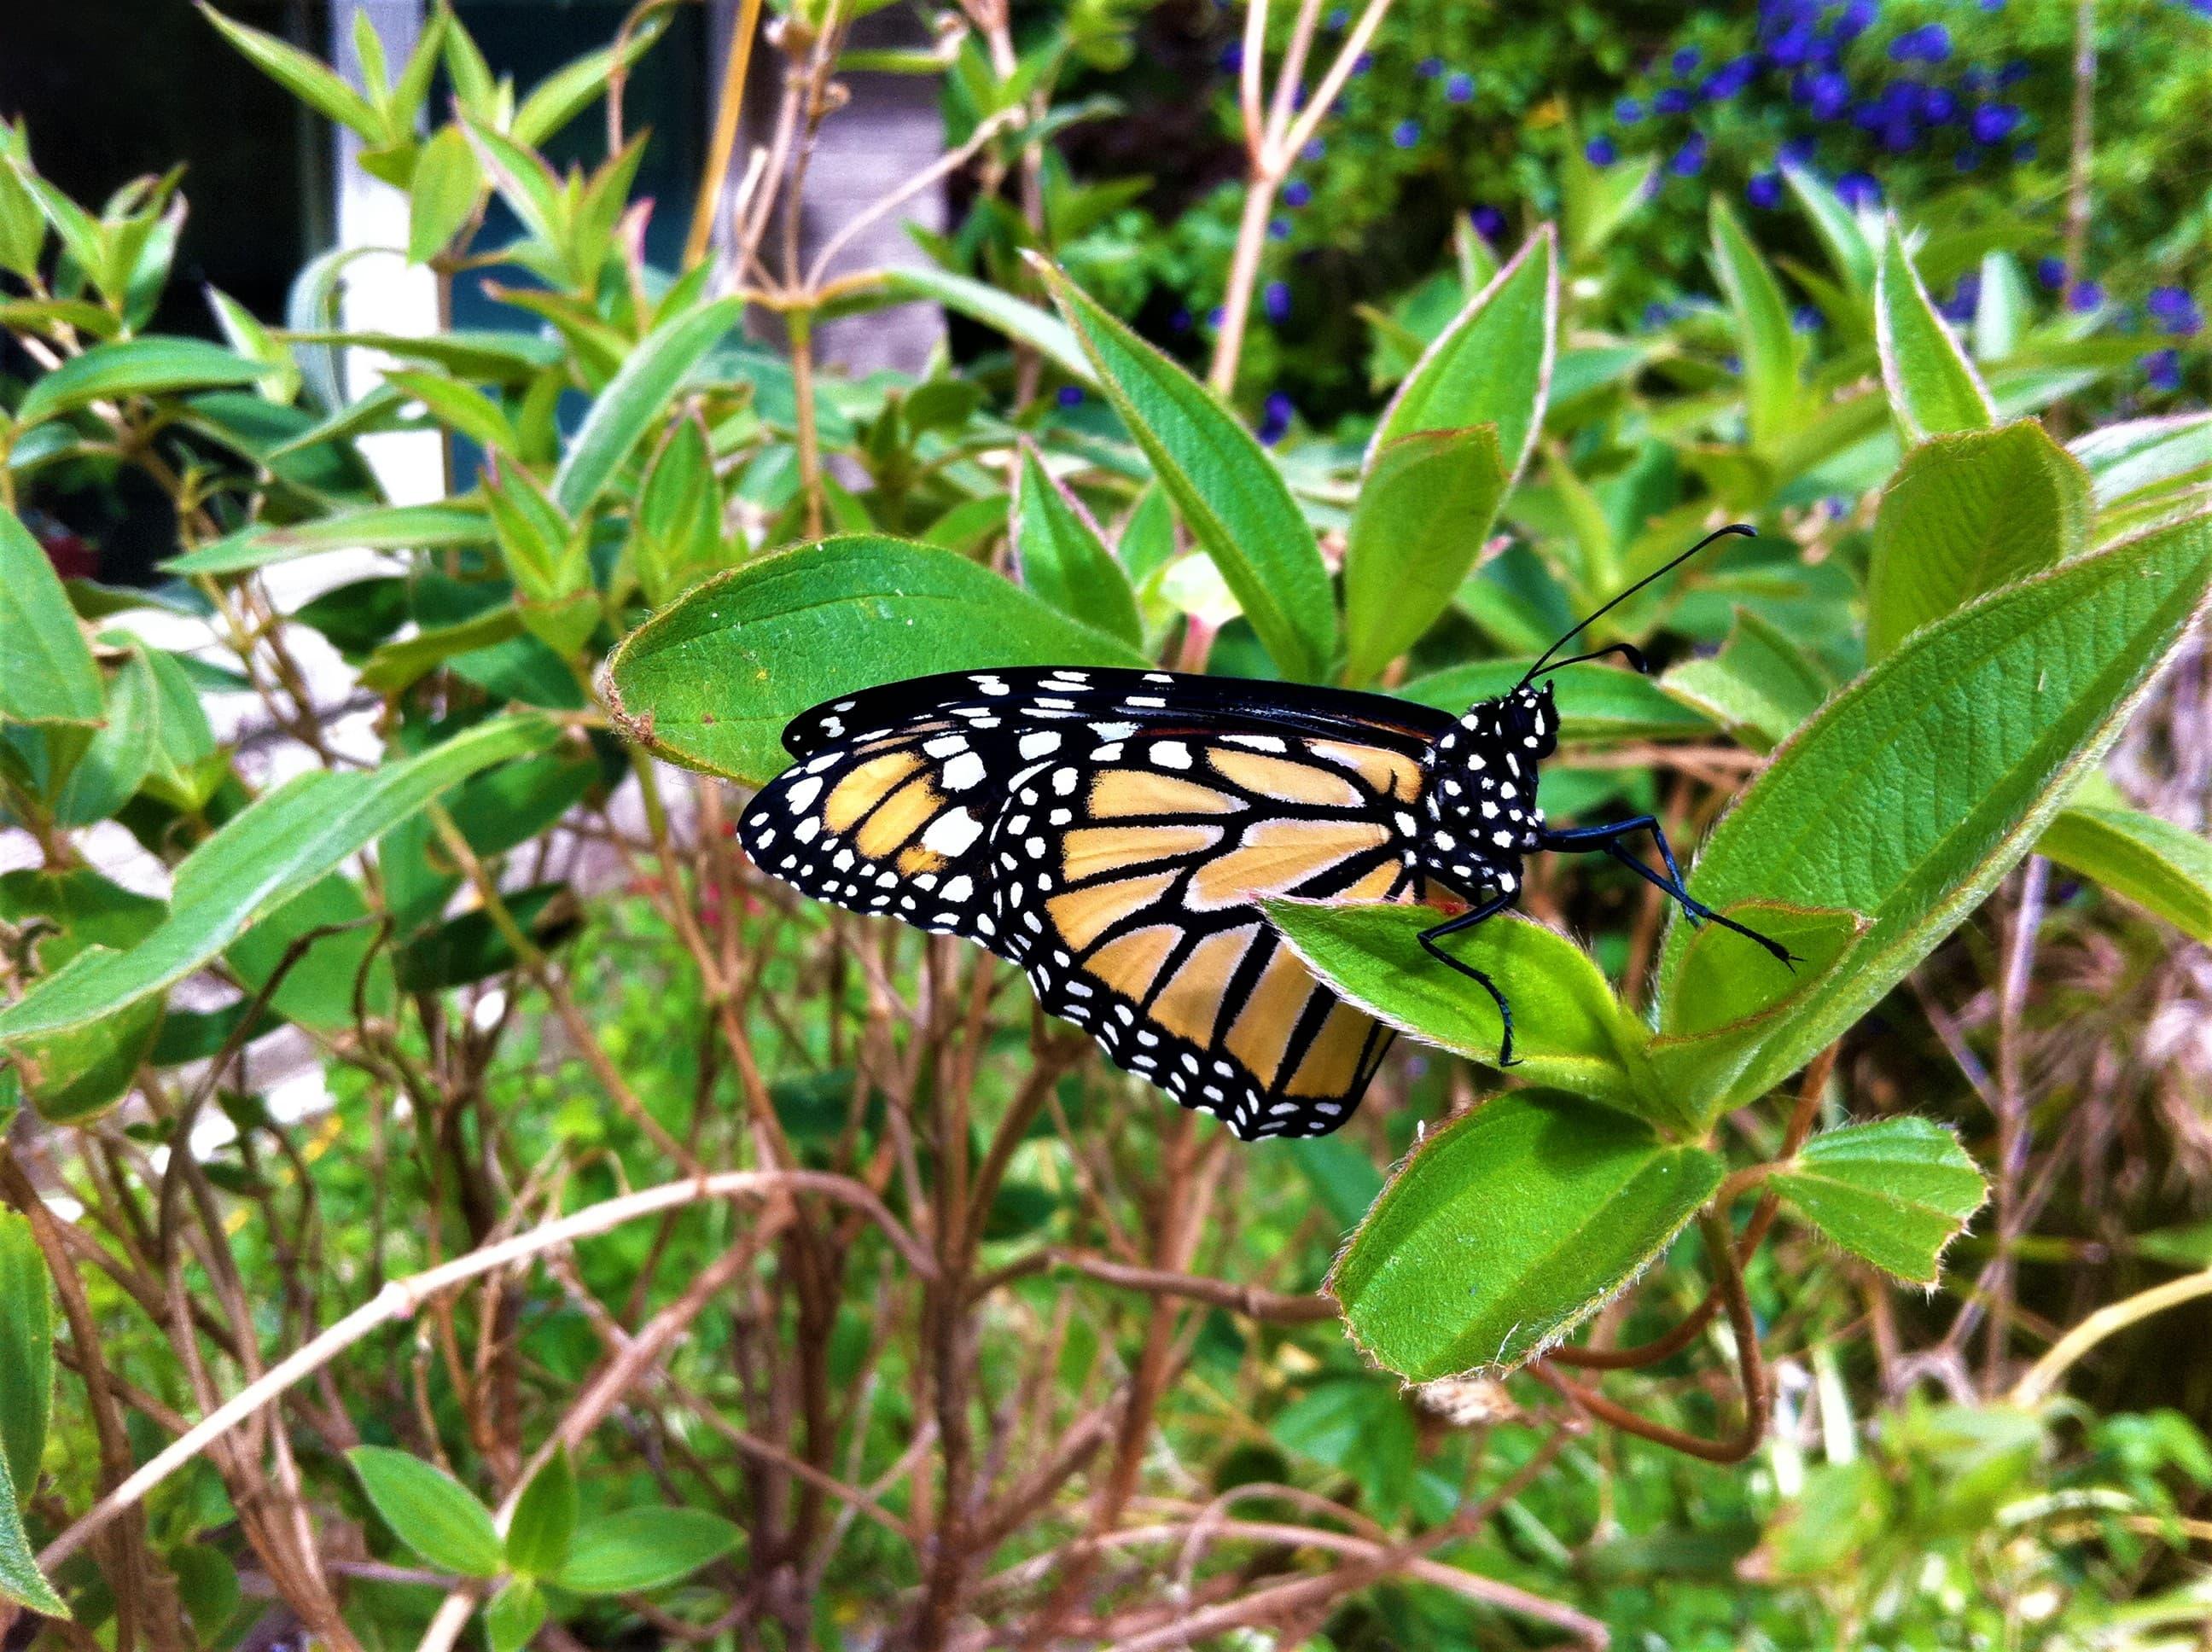 Monarch butterfly visiting my garden.